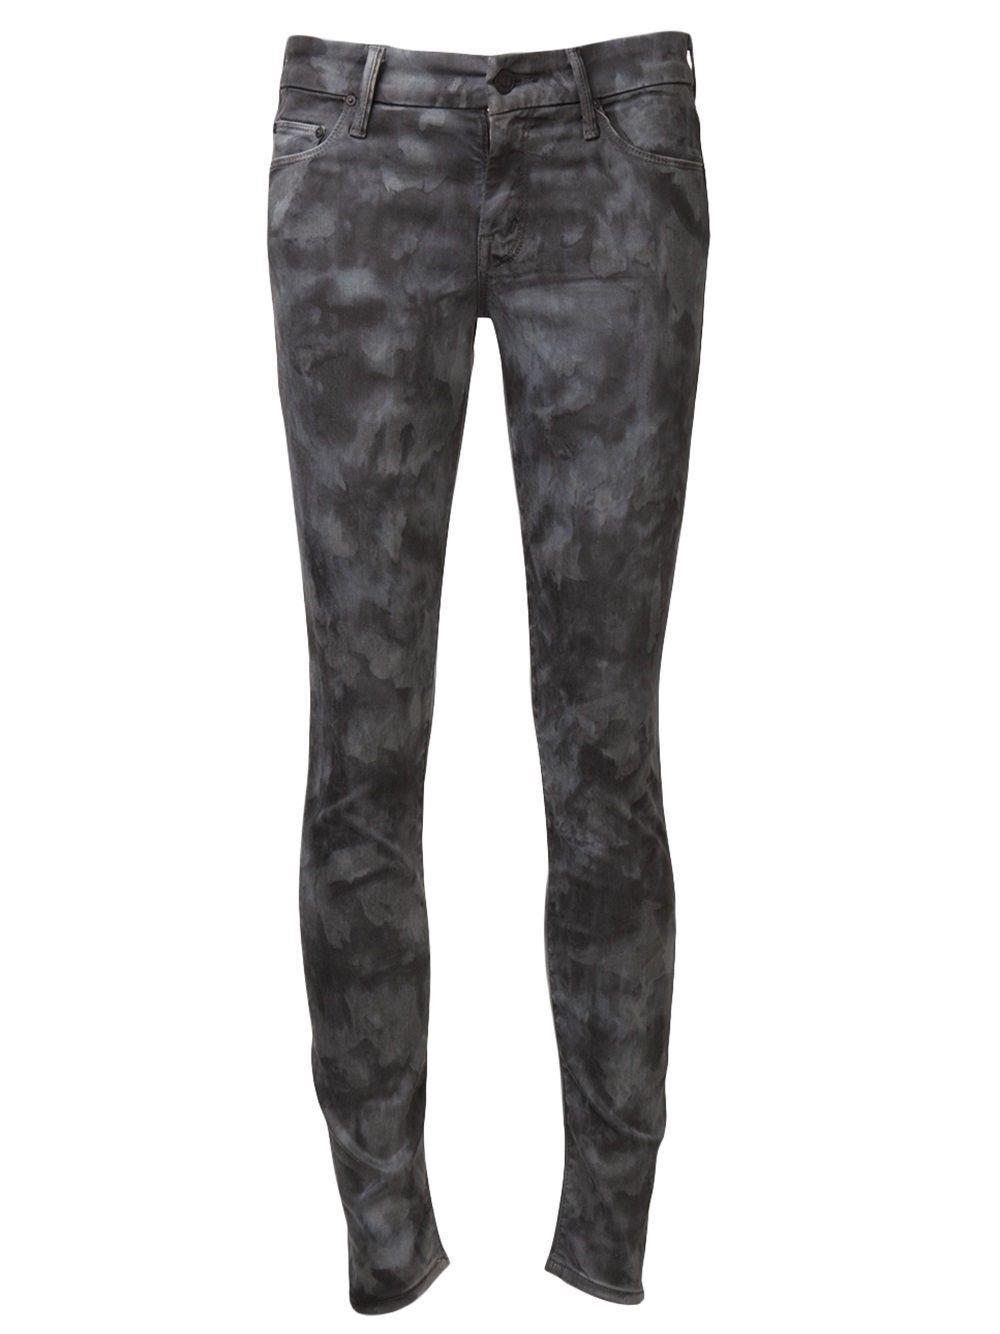 NEW Mother Denim Looker Spontaneous Combustion Grey Tie Dye  Skinny Jeans 25